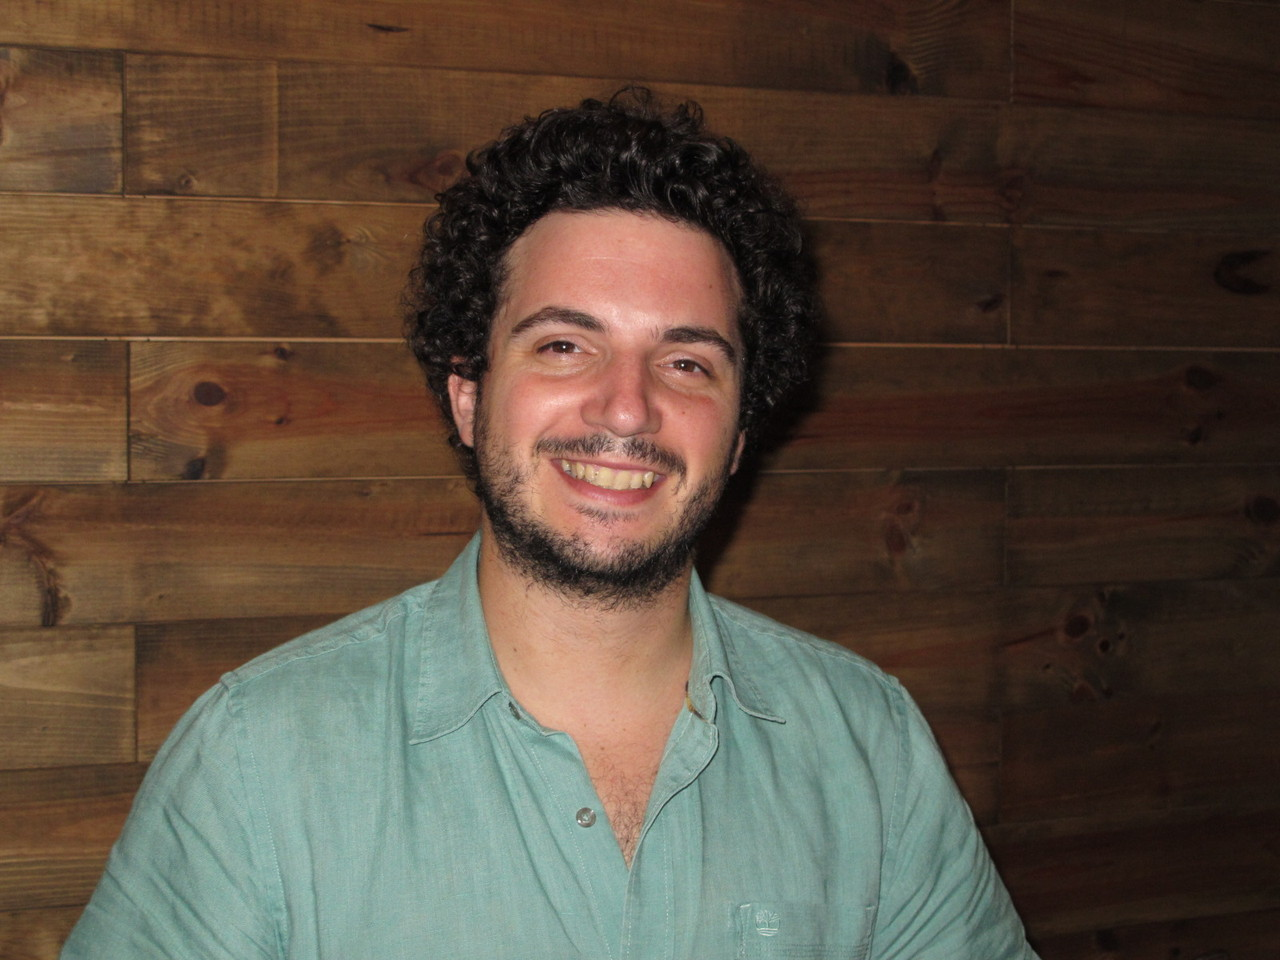 Francisco Magalhães